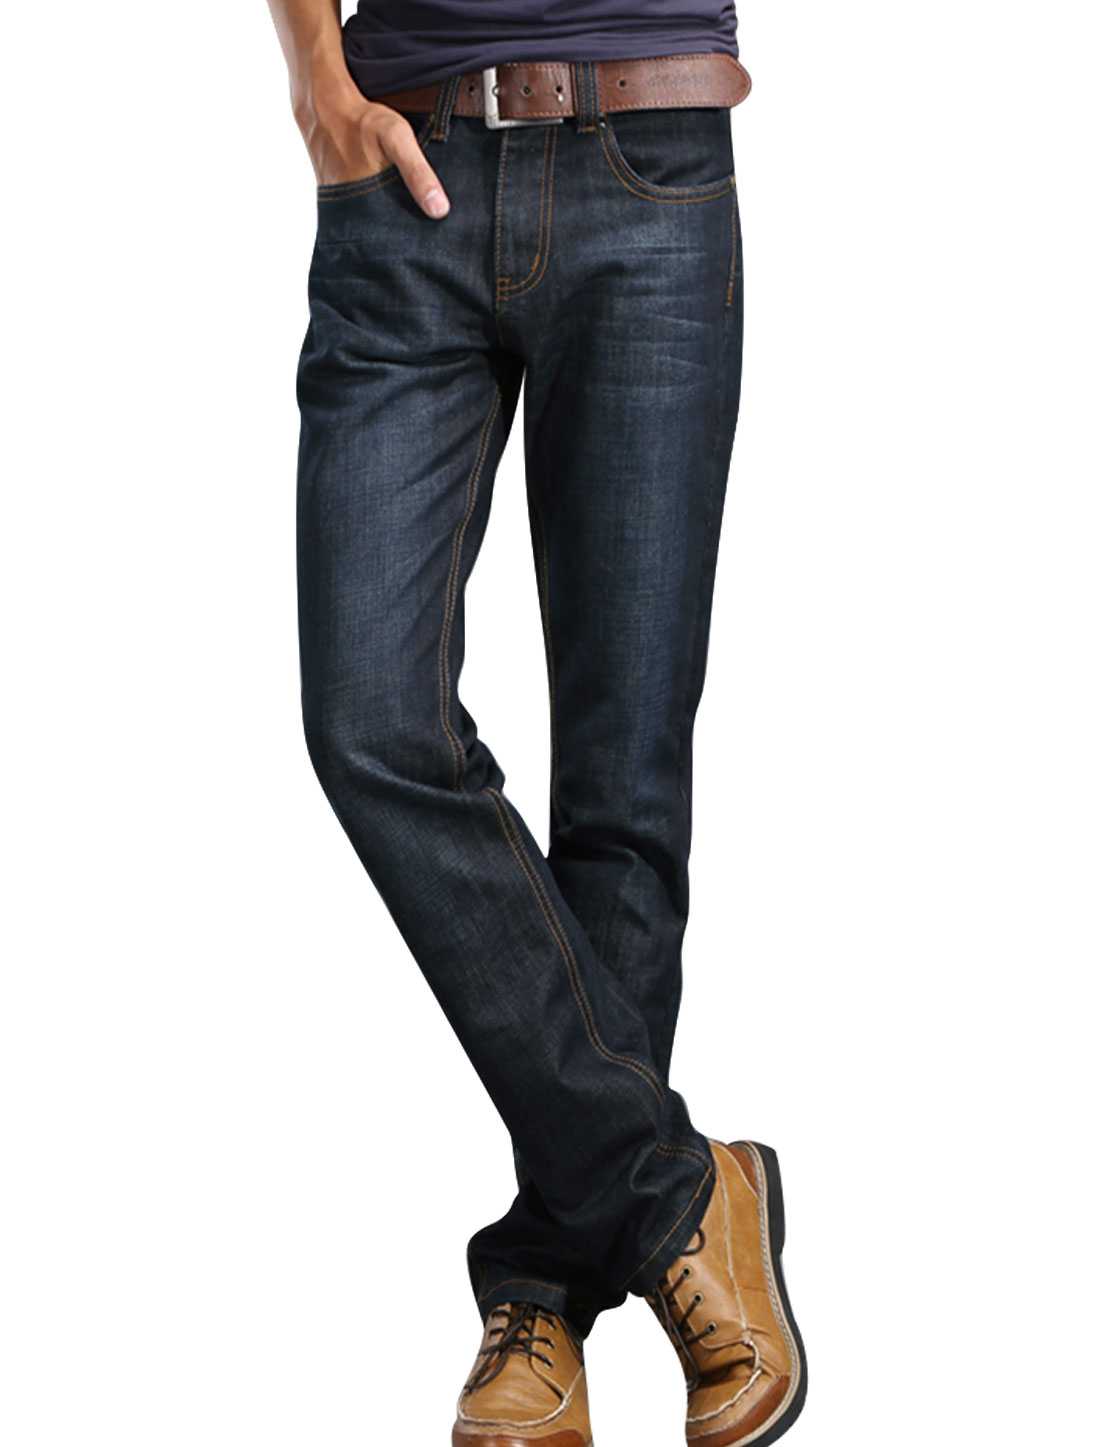 Men Black Mid Waist Zip Fly Belt Loop Button Closure Front Pockets Jeans W30